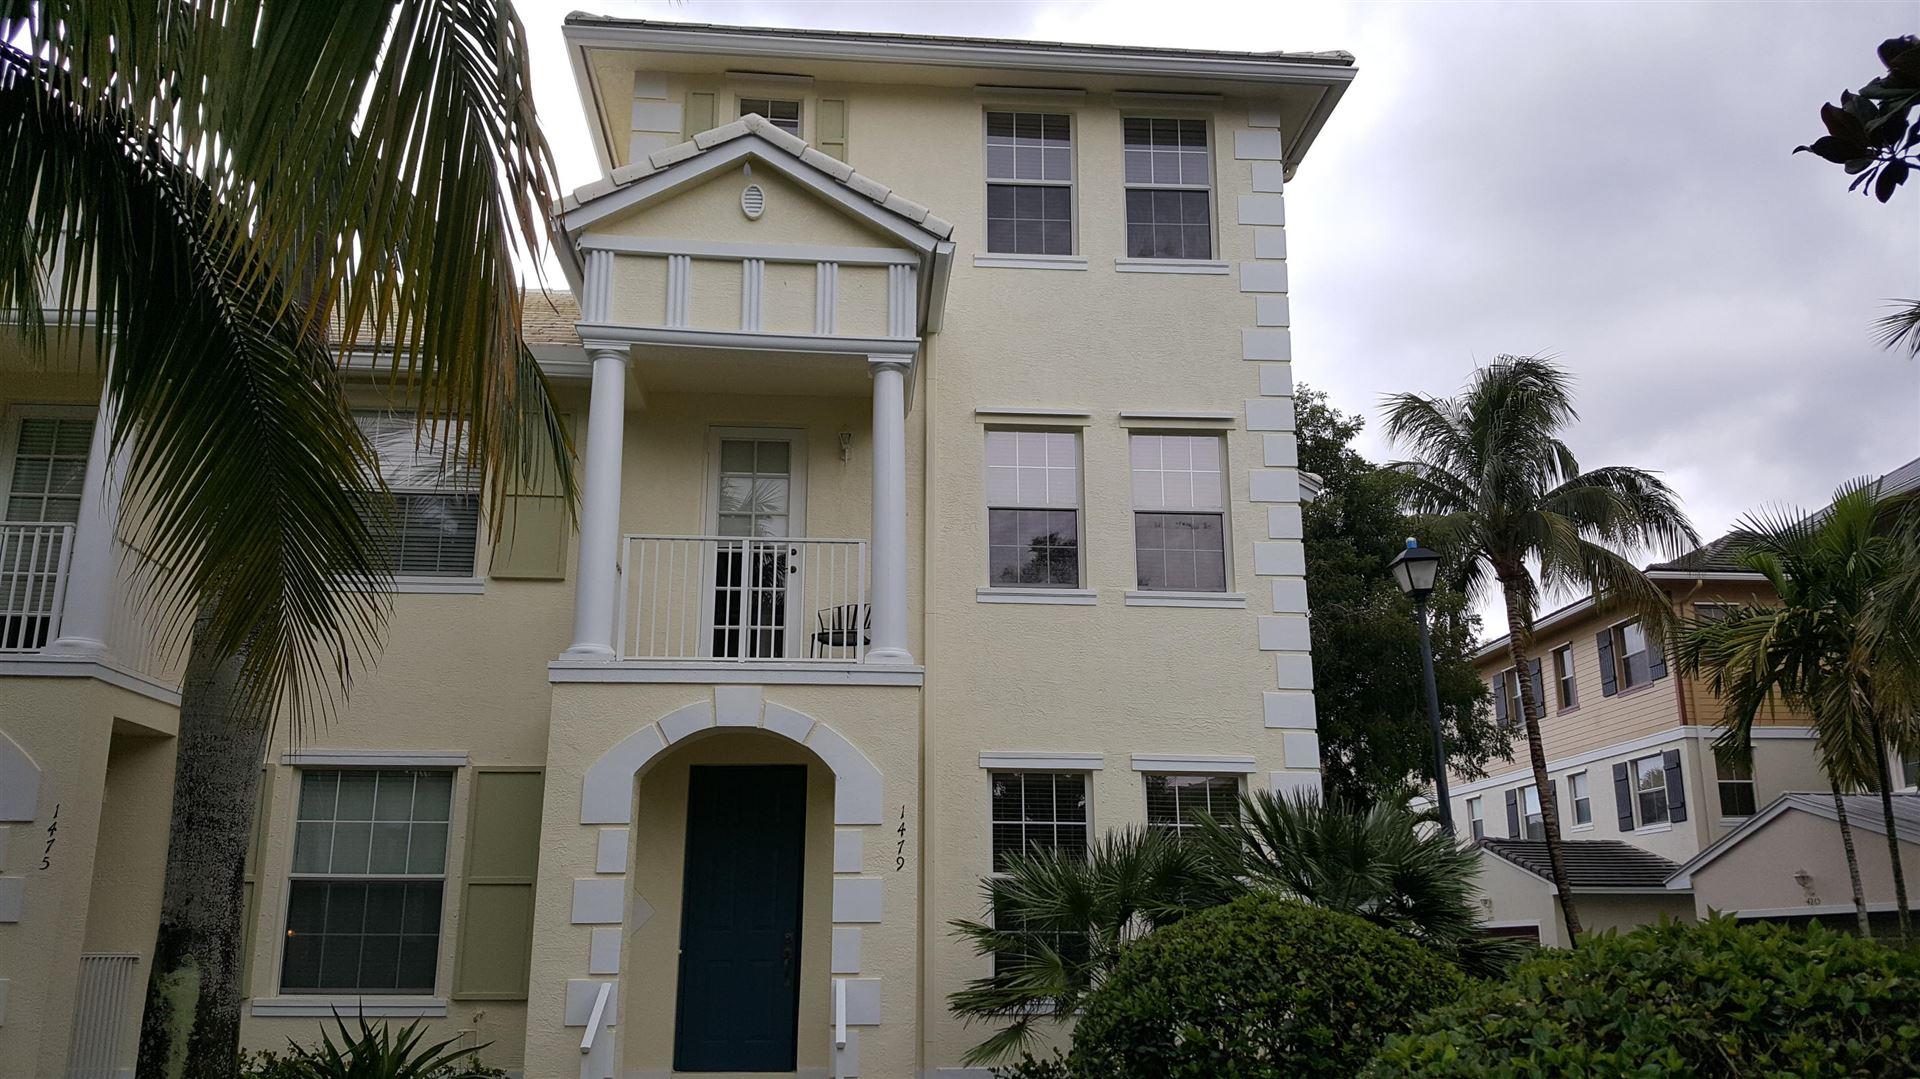 Photo of 1479 Scilly Cay Lane, Jupiter, FL 33458 (MLS # RX-10658582)